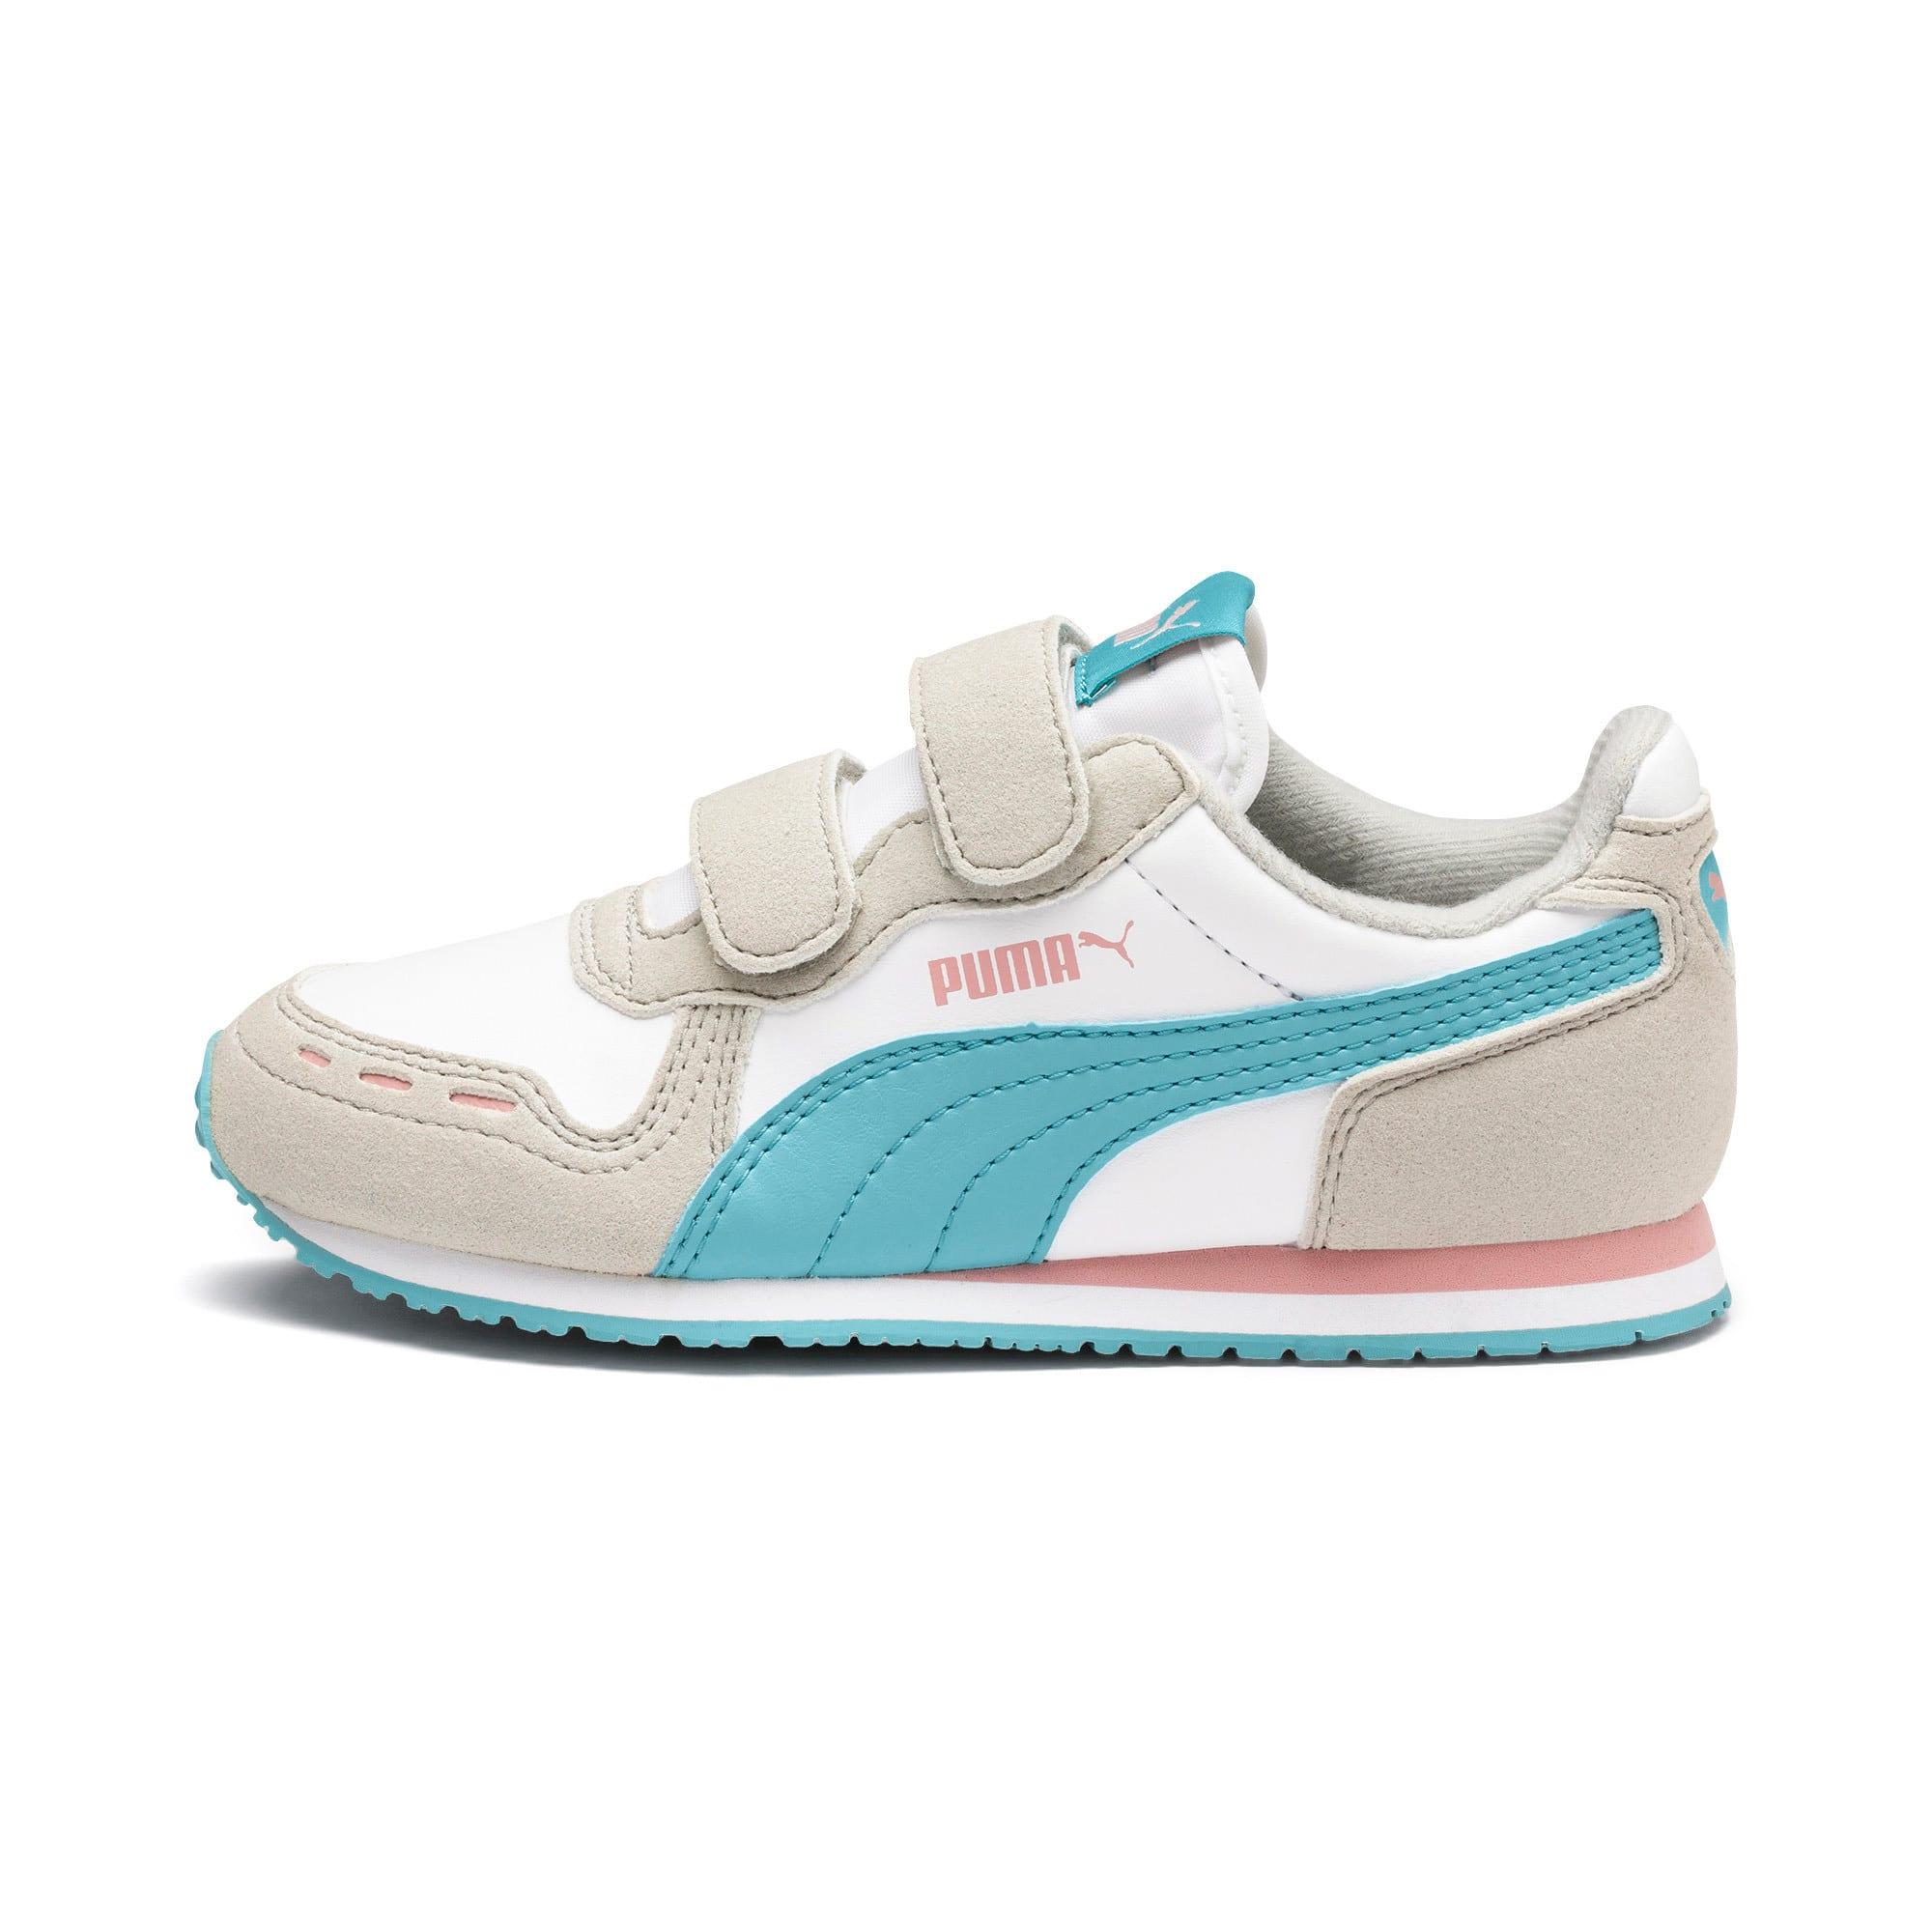 Thumbnail 1 of Cabana Racer SL V PS Baby Sneaker, Puma White-Milky Blue, medium